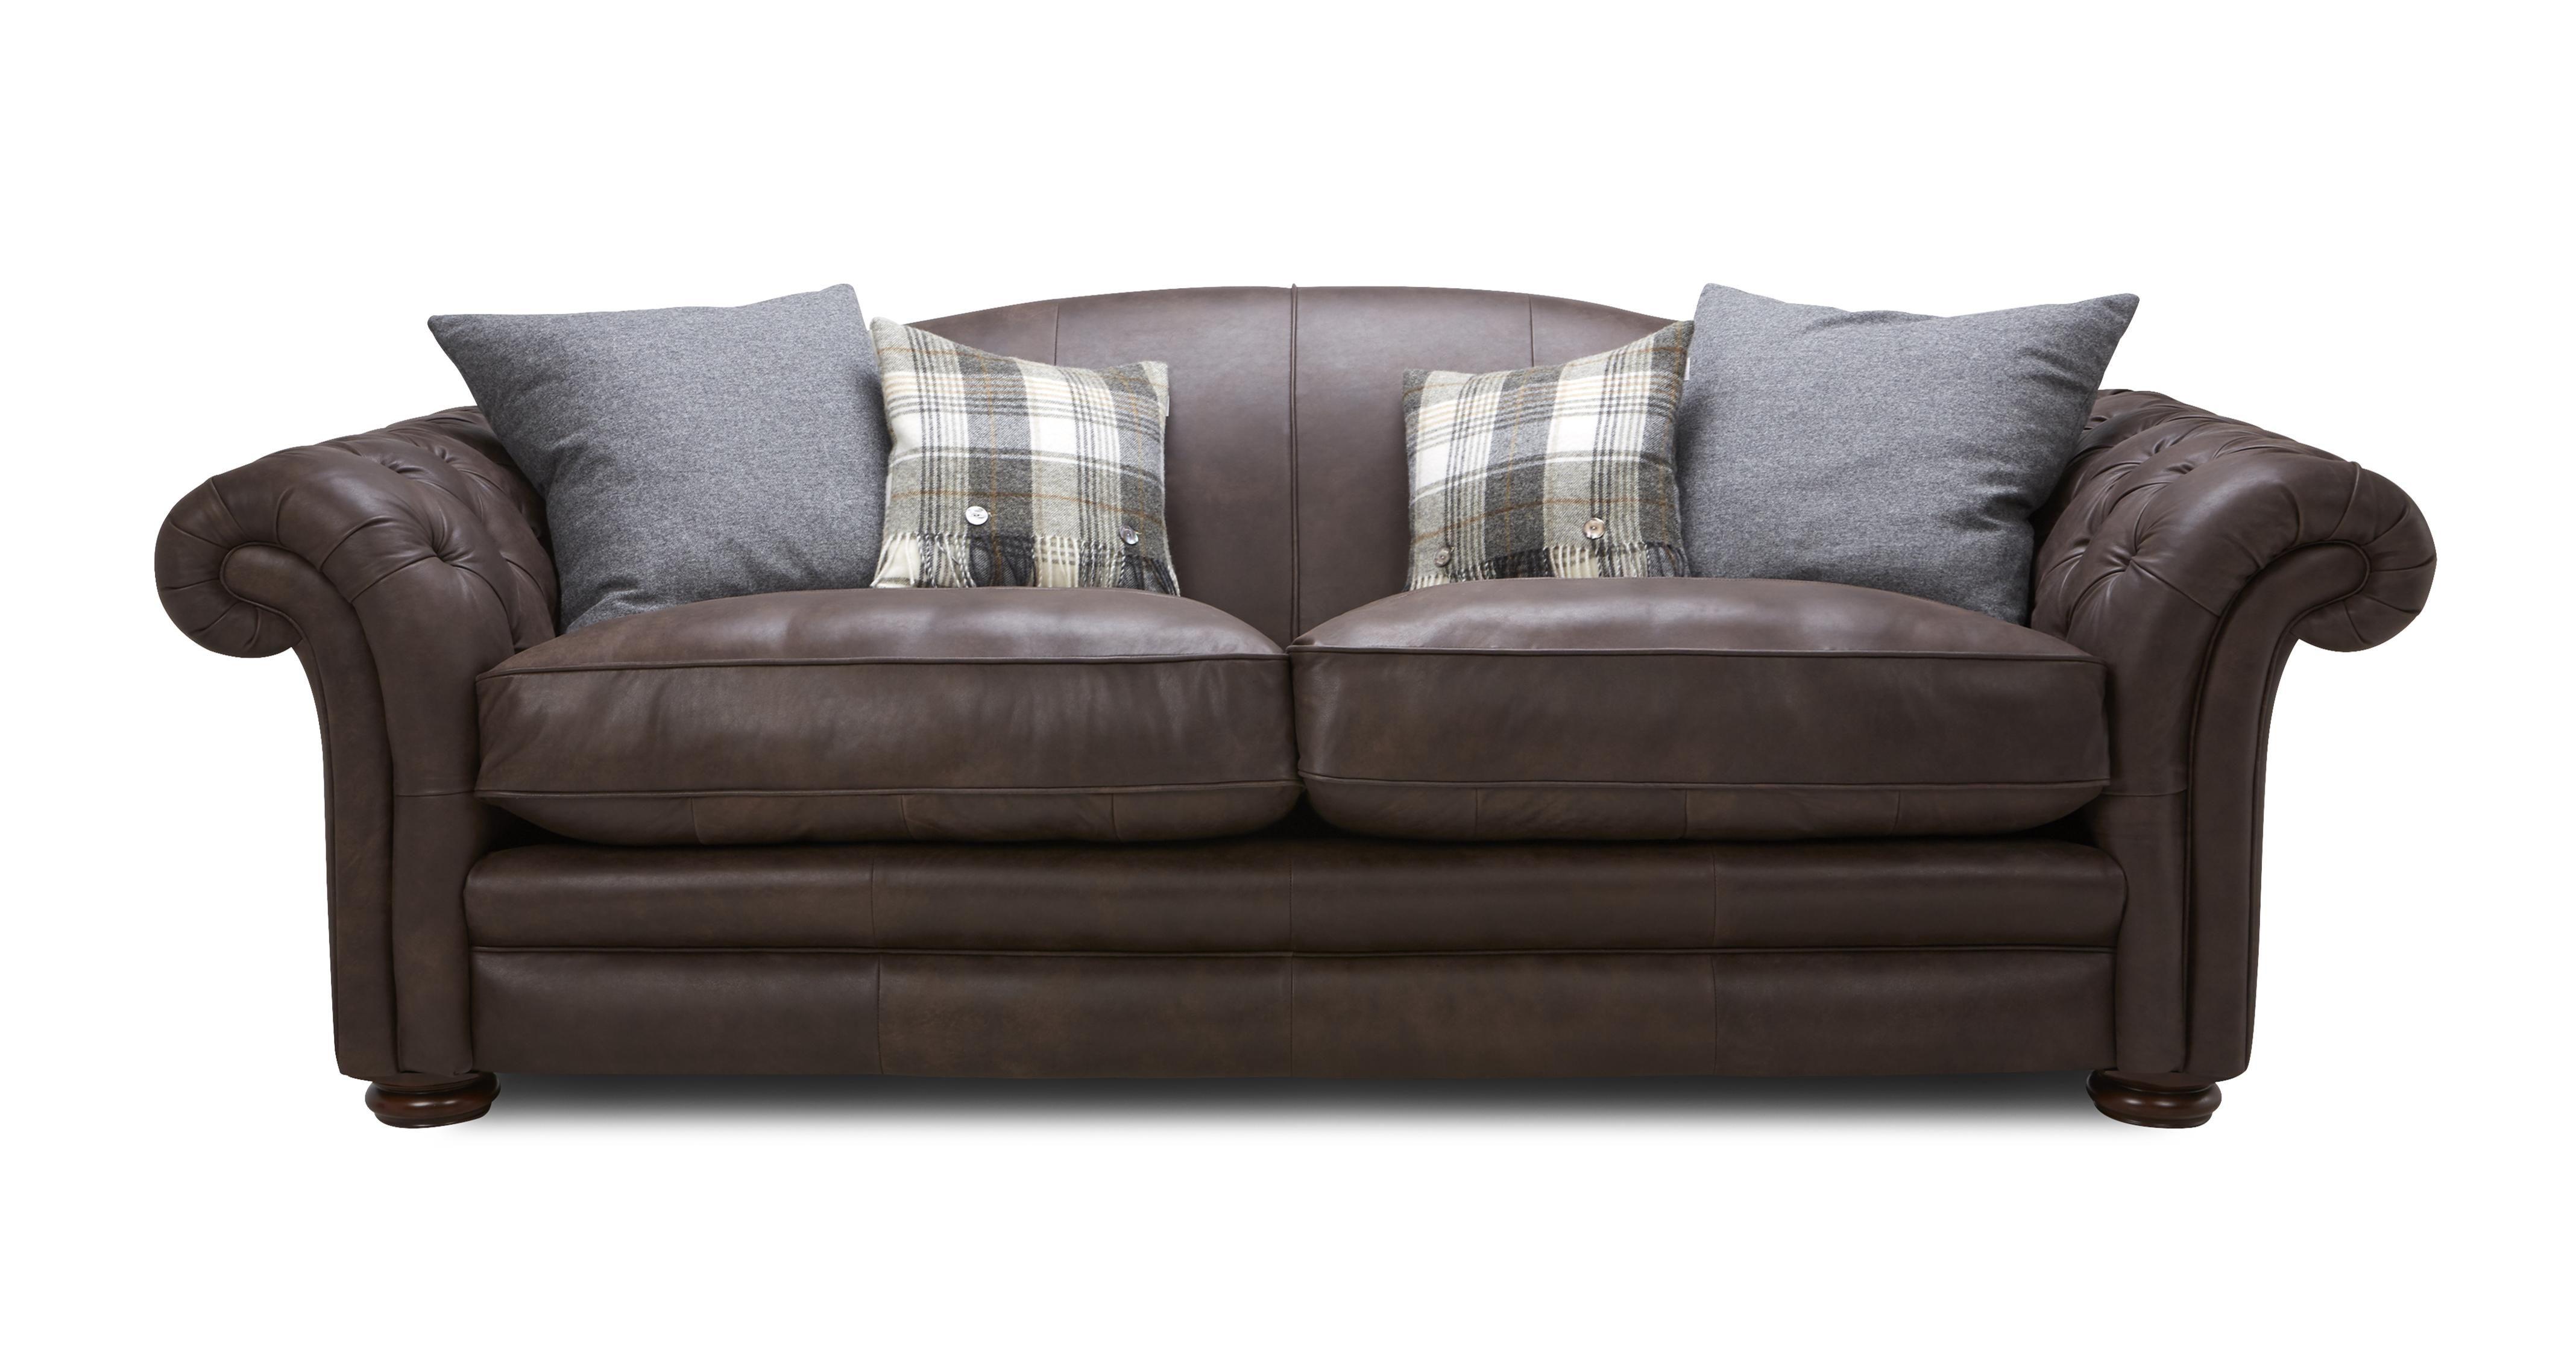 Loch Leven Leather 4 Seater Sofa Sofa Tan Leather Sofas Seater Sofa